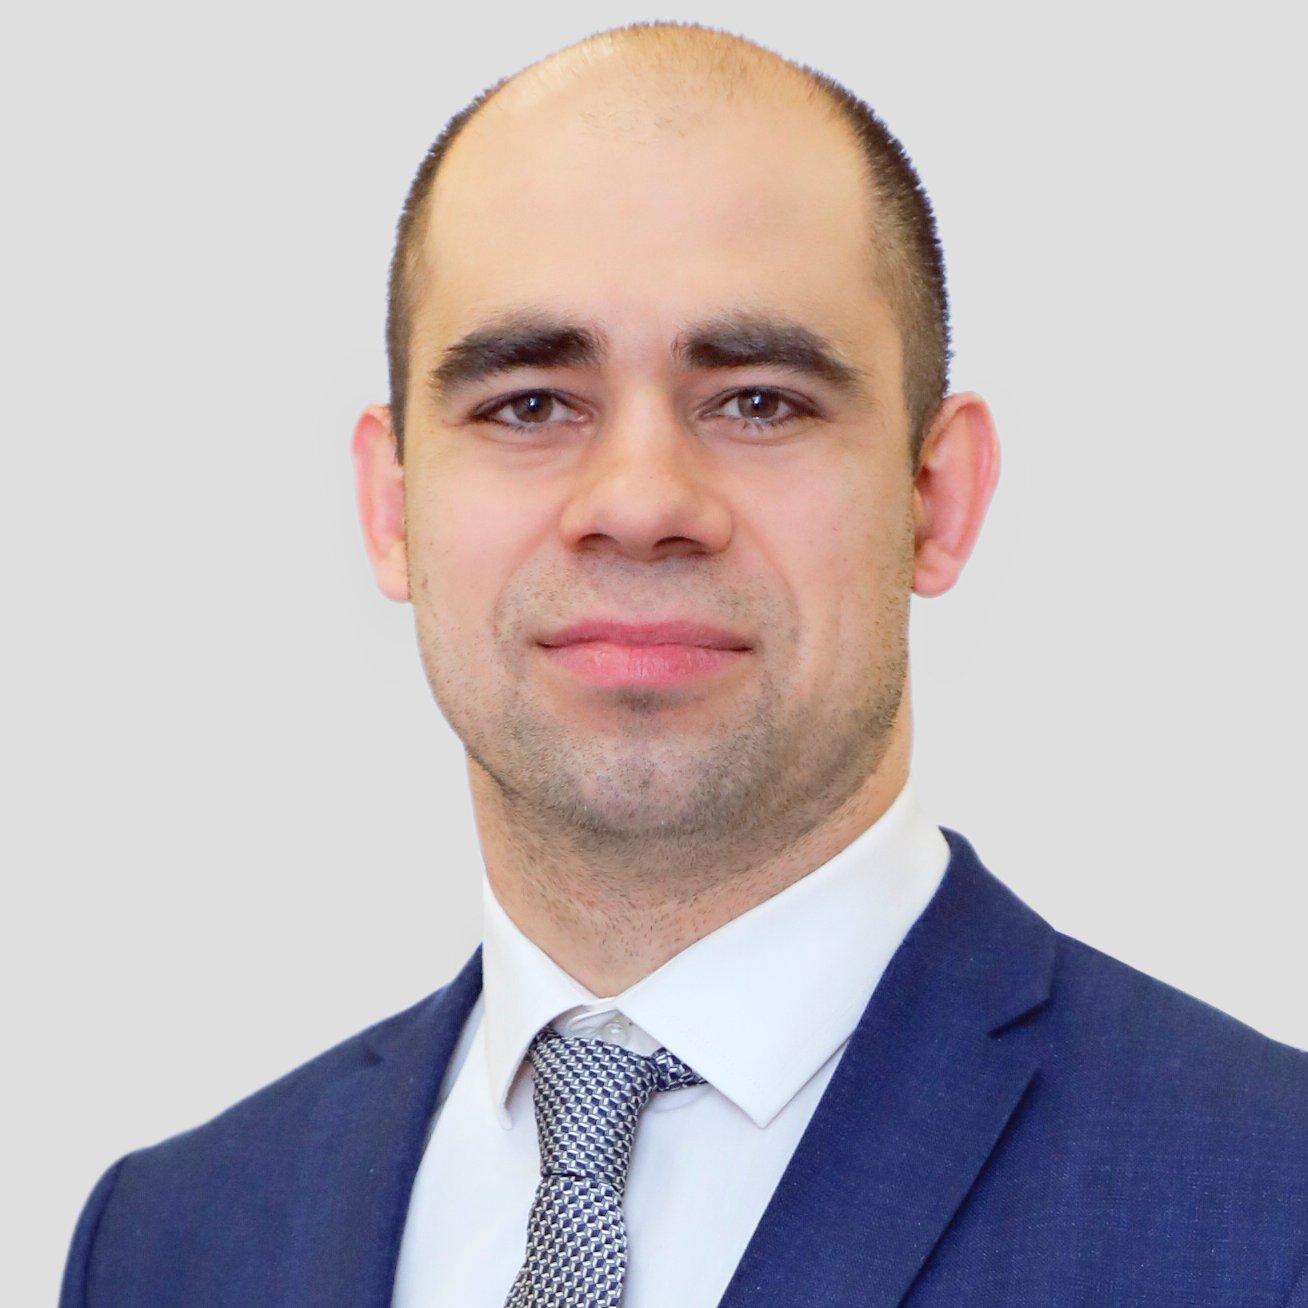 Антон Семейкин, Минэнерго